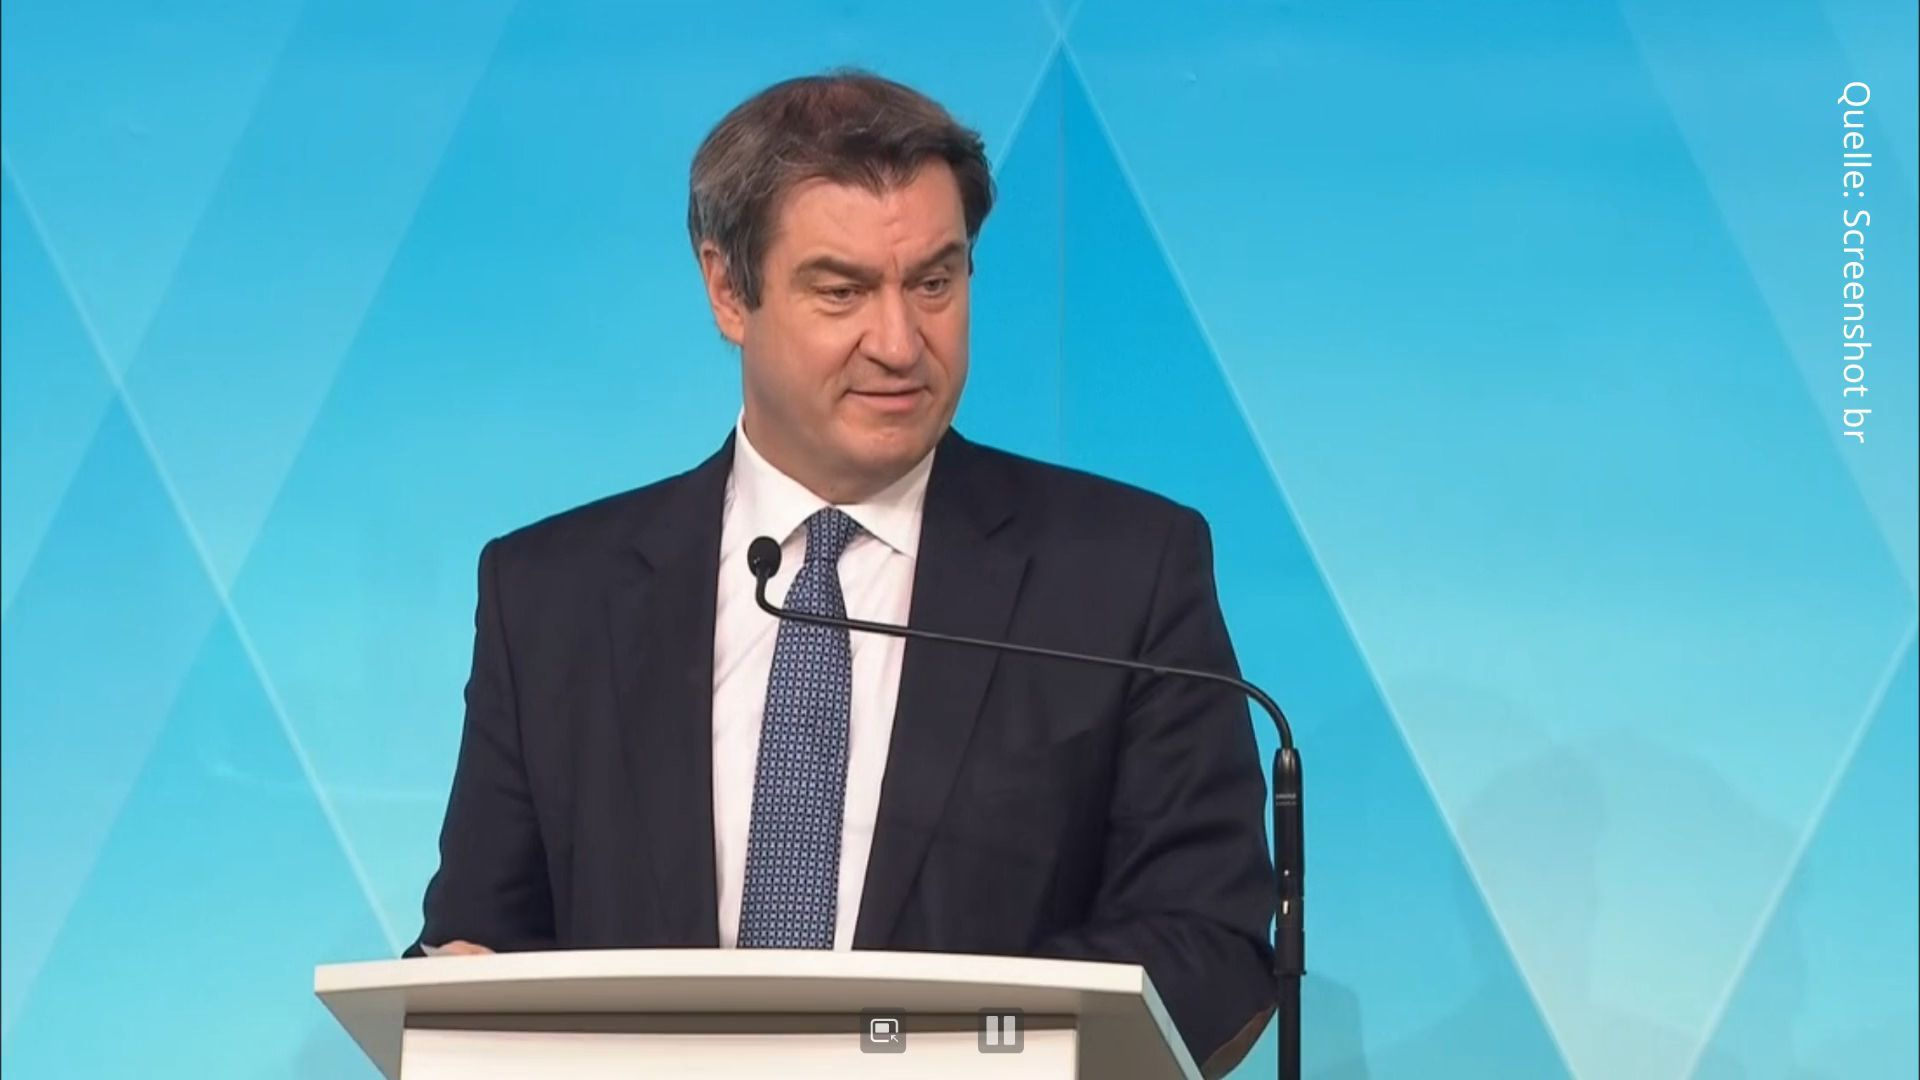 Coronavirus: Ministerpräsident Söder bestätigt Kurs der Bundesregierung